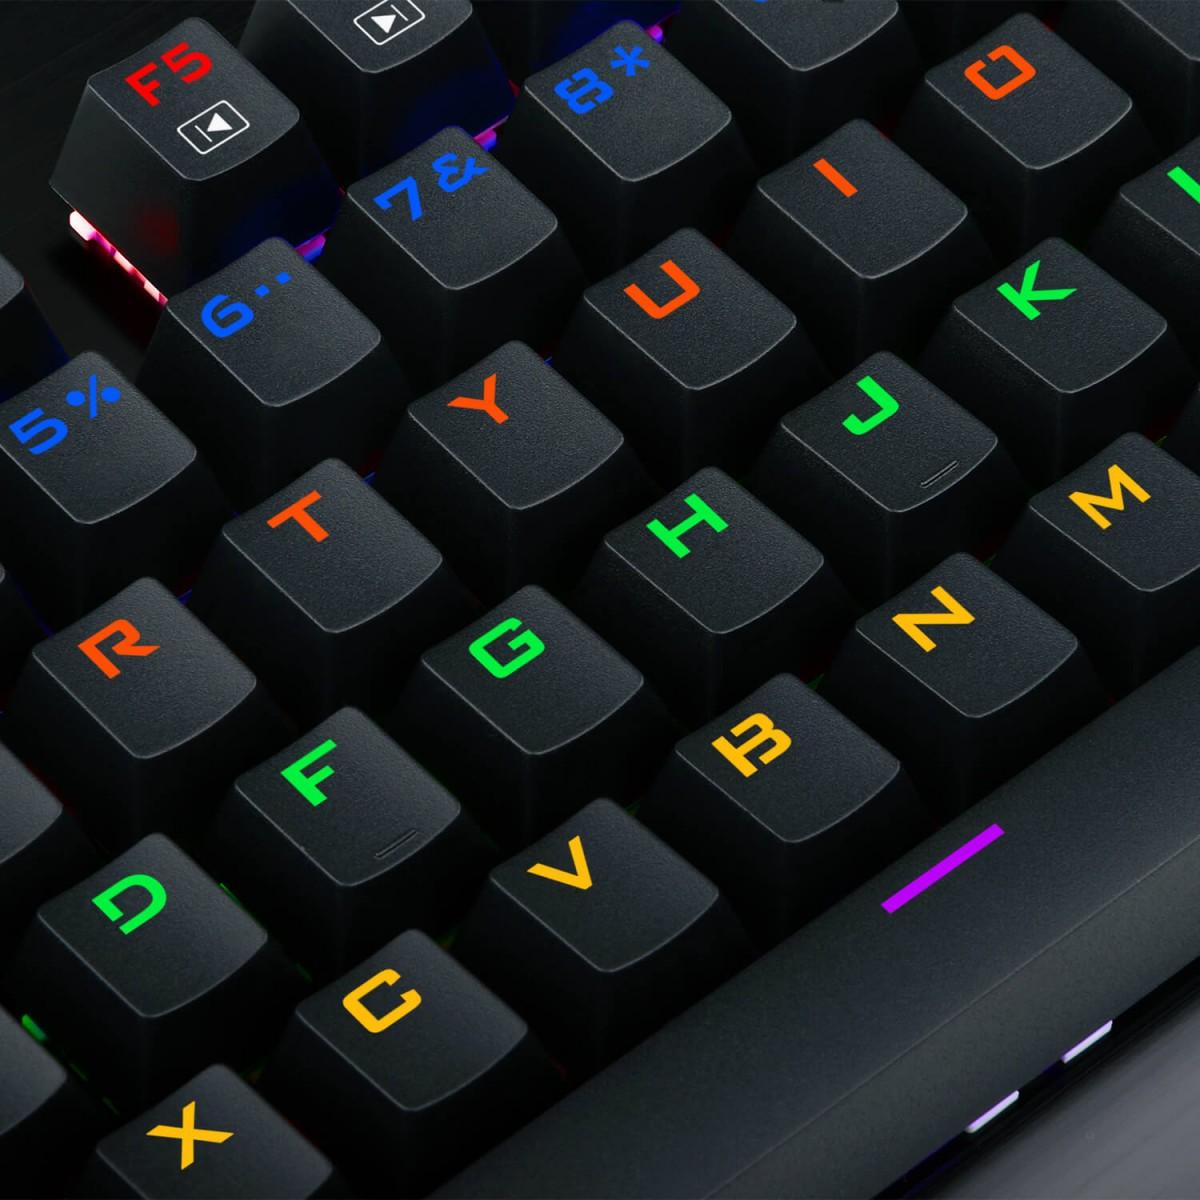 Teclado Gamer Mecânico Redragon Visnu Rainbow, Switch Blue, ABNT2, Black, K561R-2